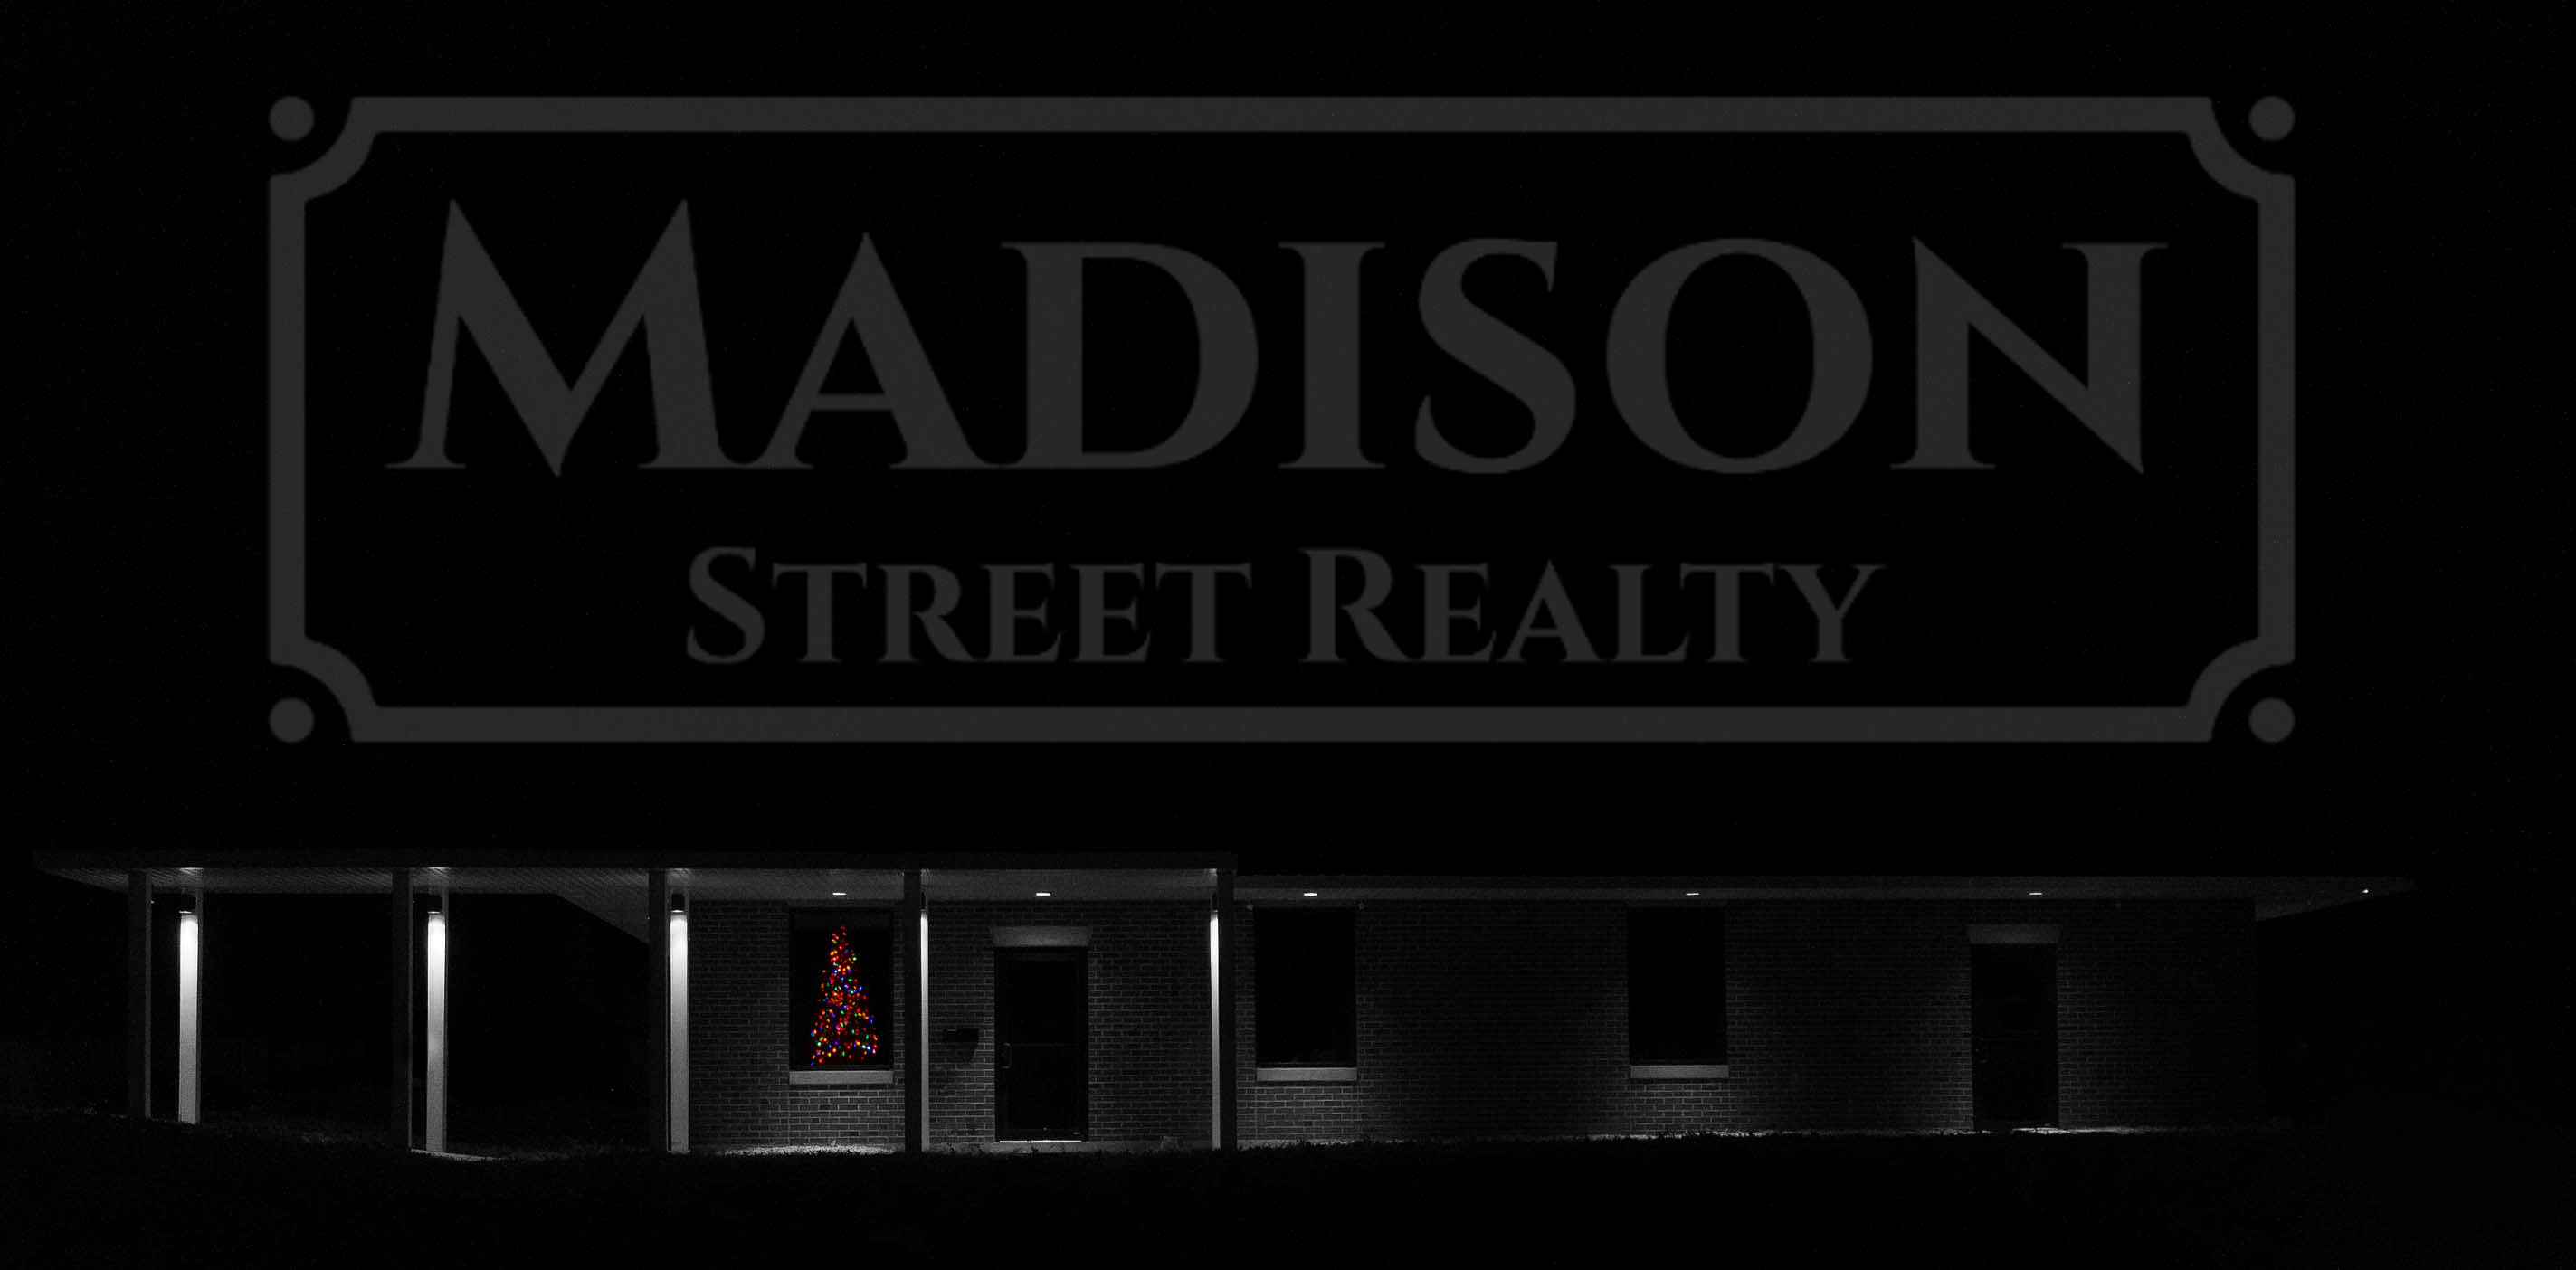 900 Madison Street at night